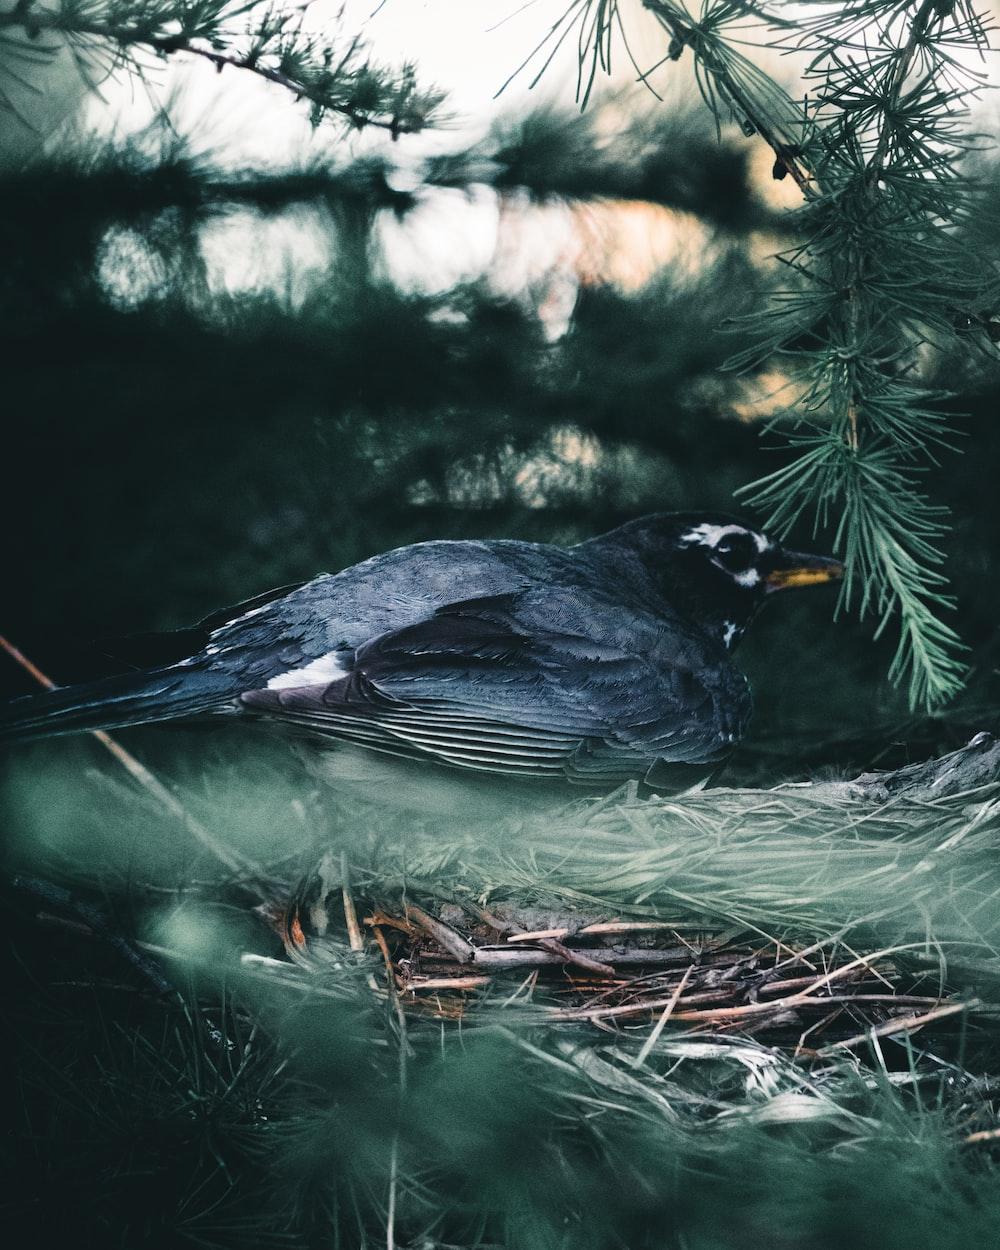 black and yellow bird on tree branch